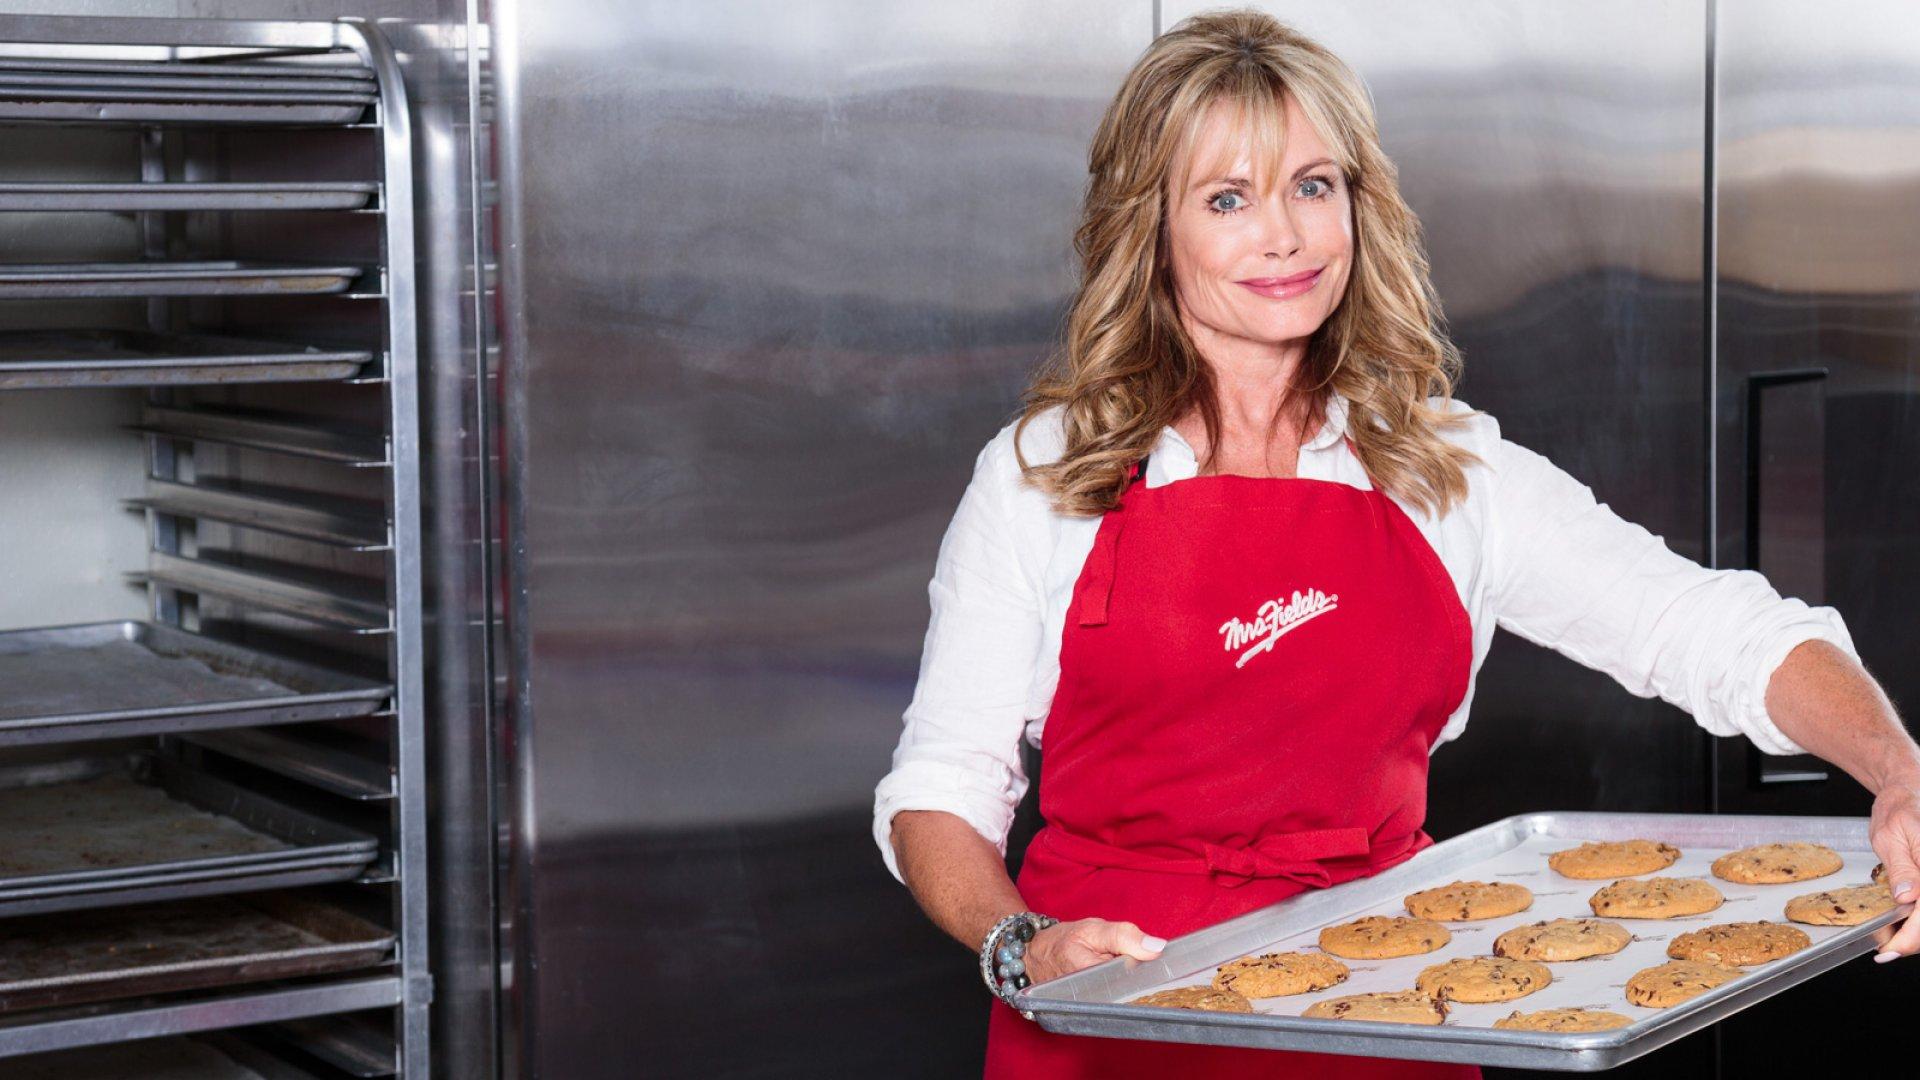 An Entrepreneur At Heart, Debbi Fields Misses Running the Show